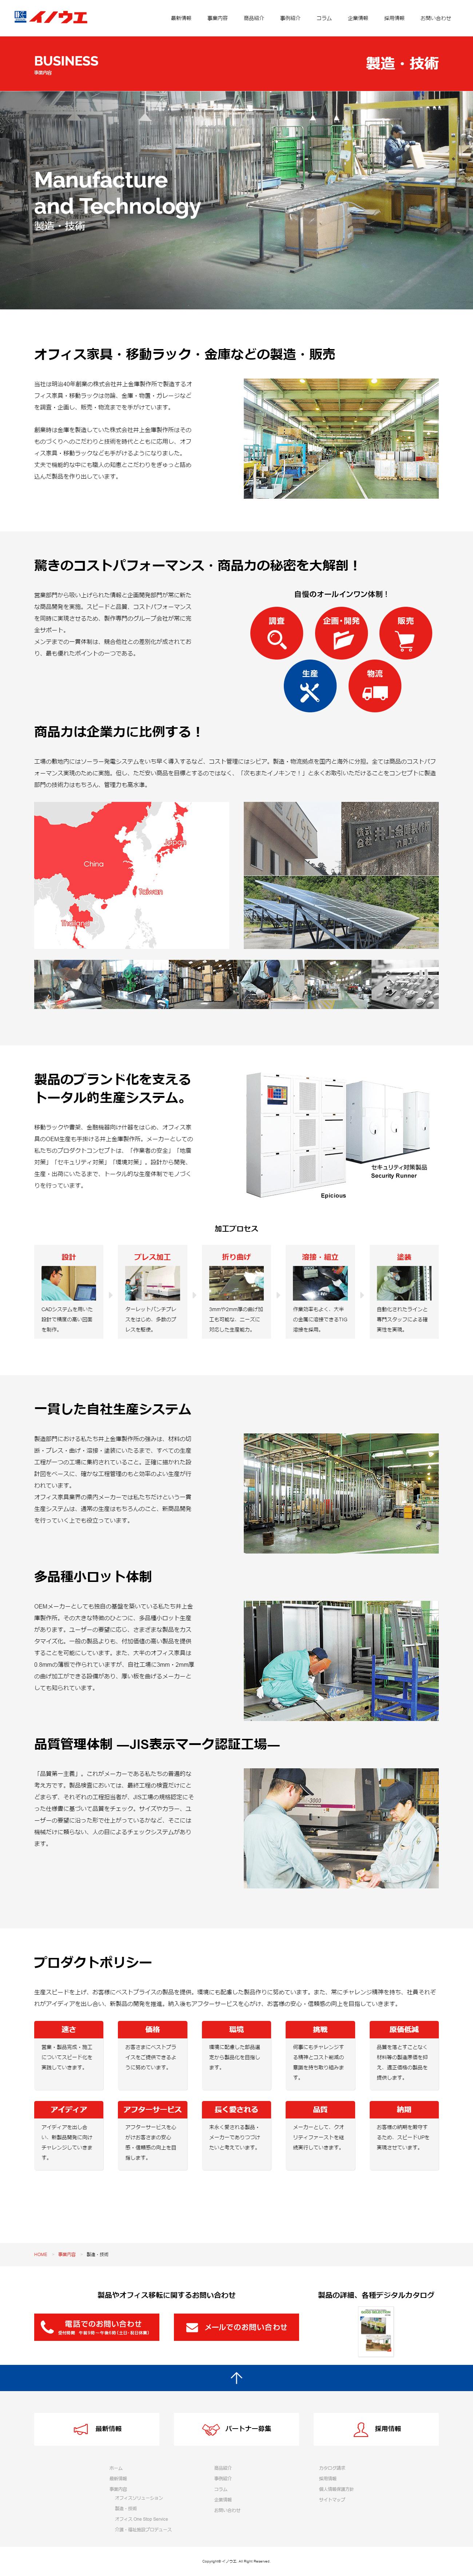 福井市 井上金庫販売株式会社様 ホームページ制作2